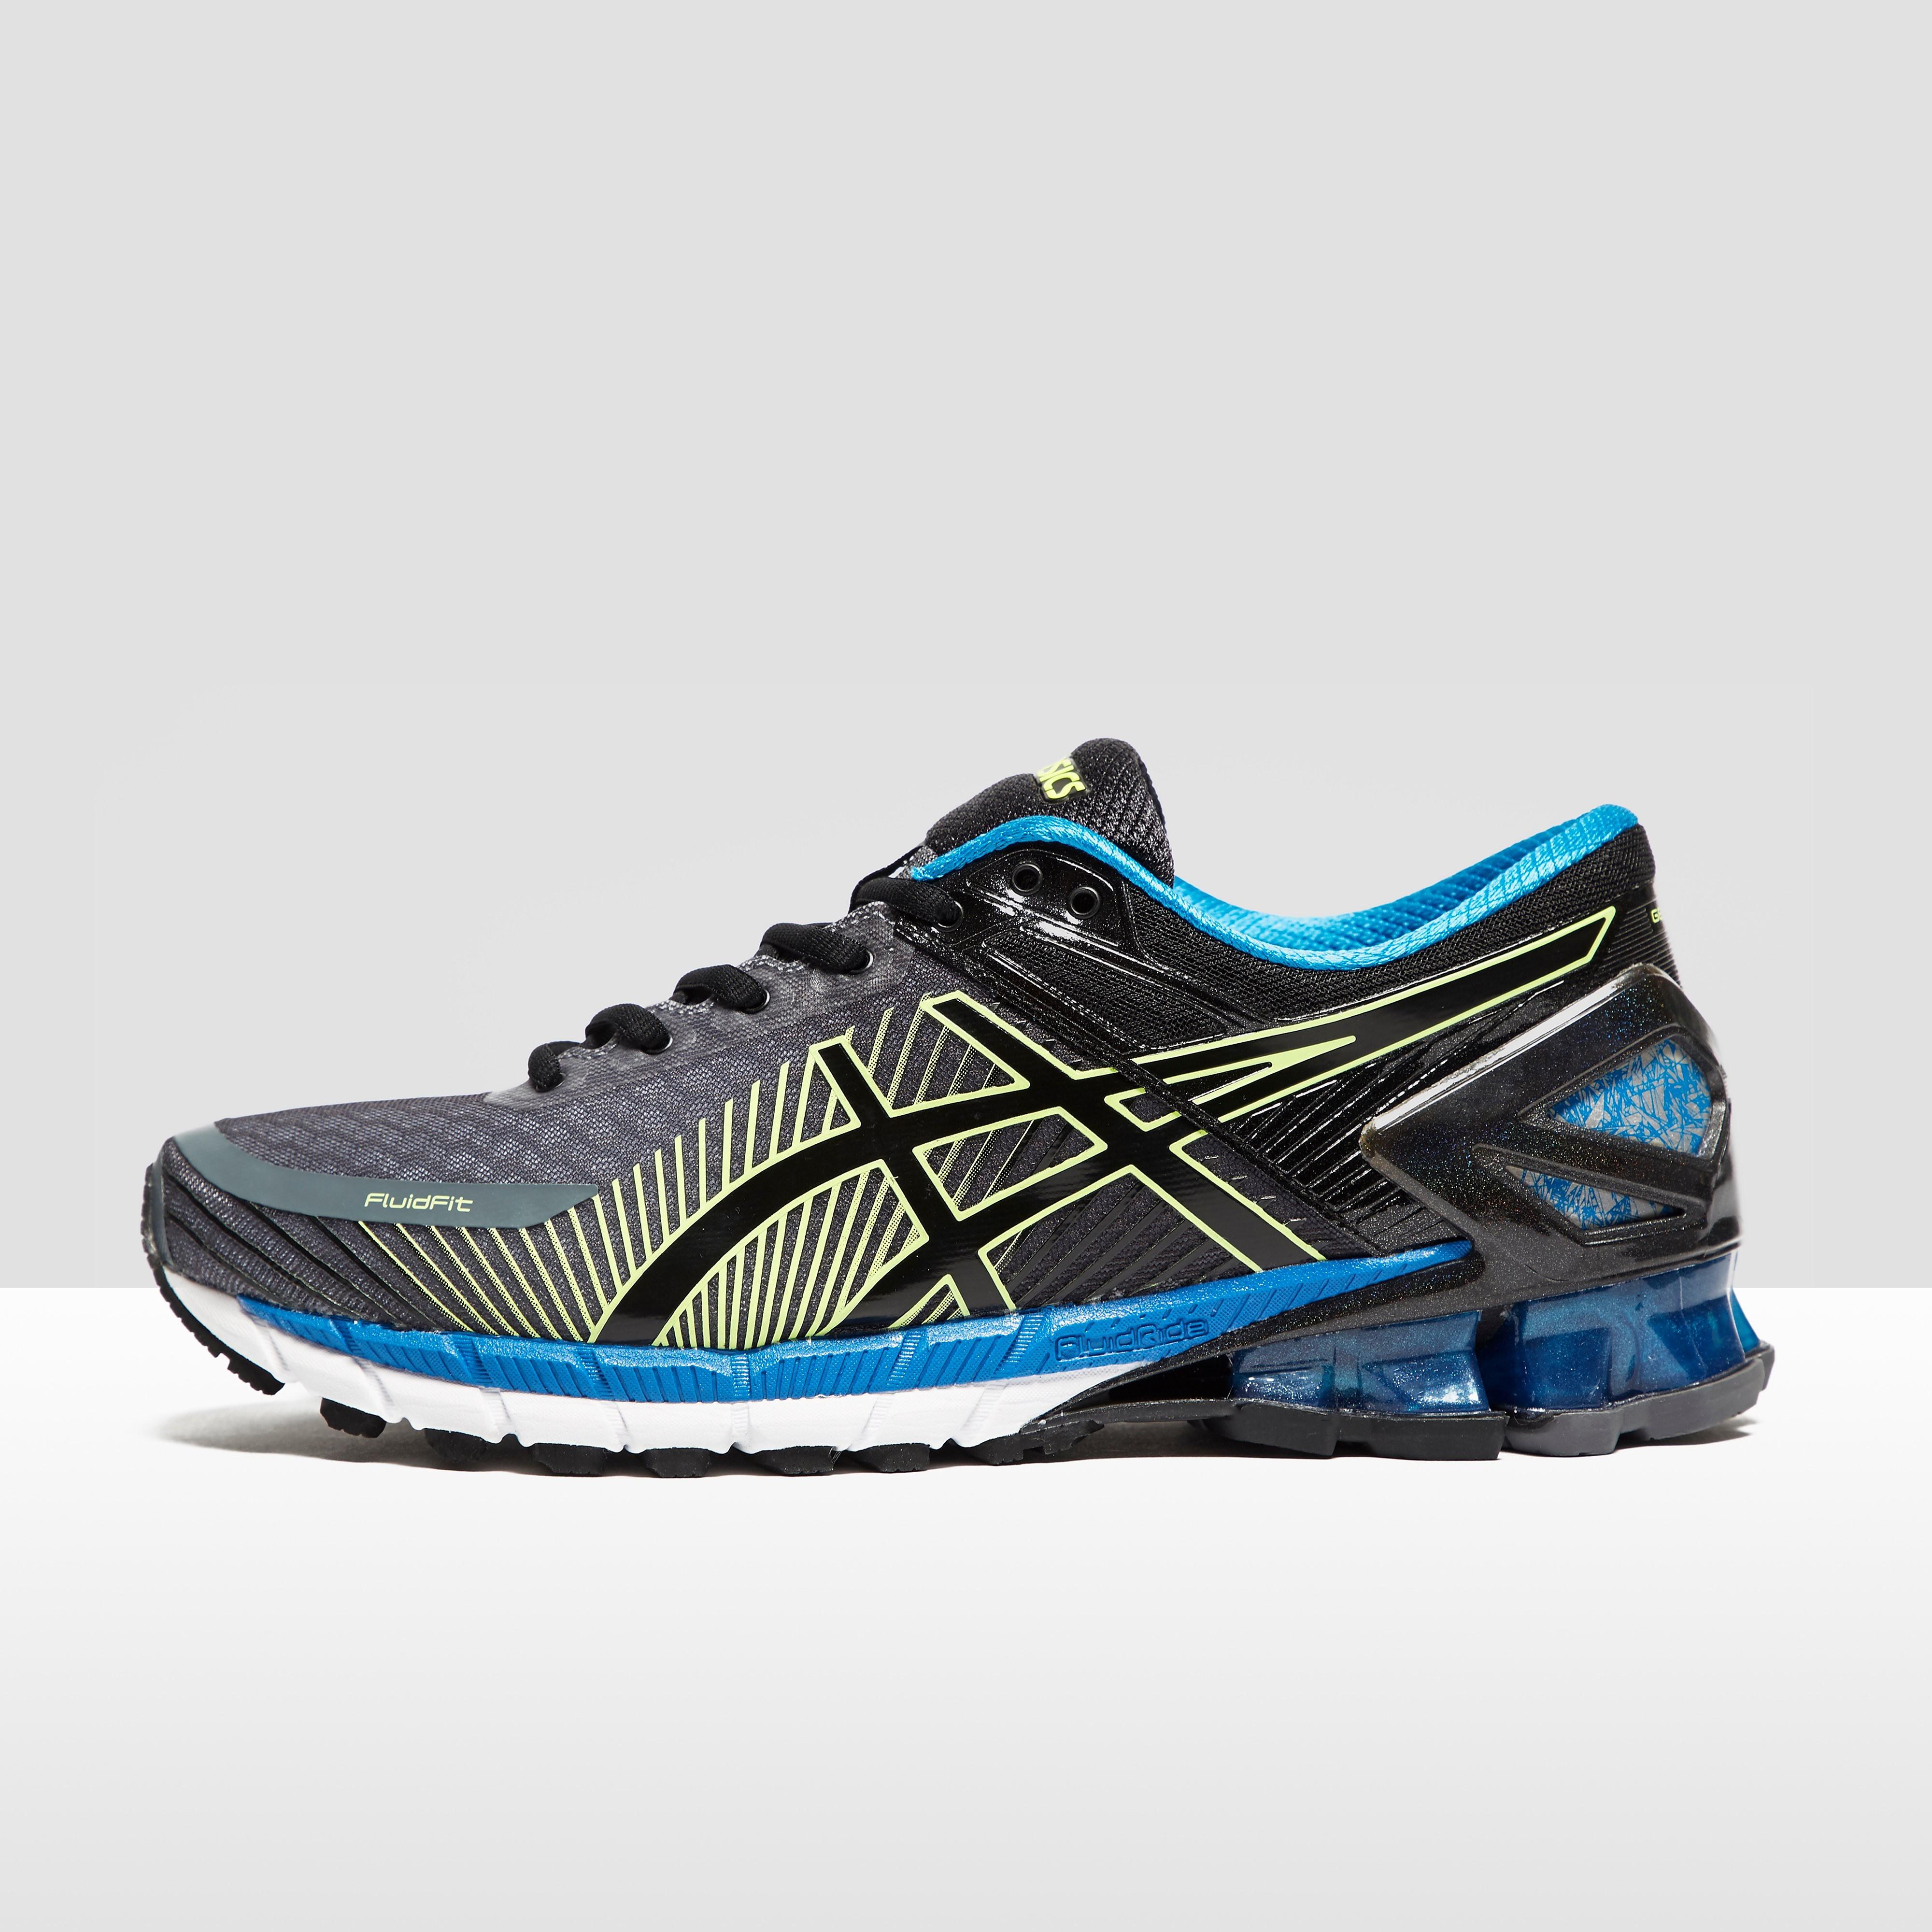 Asics GEL- Kinsei 6 Men's Running Shoes